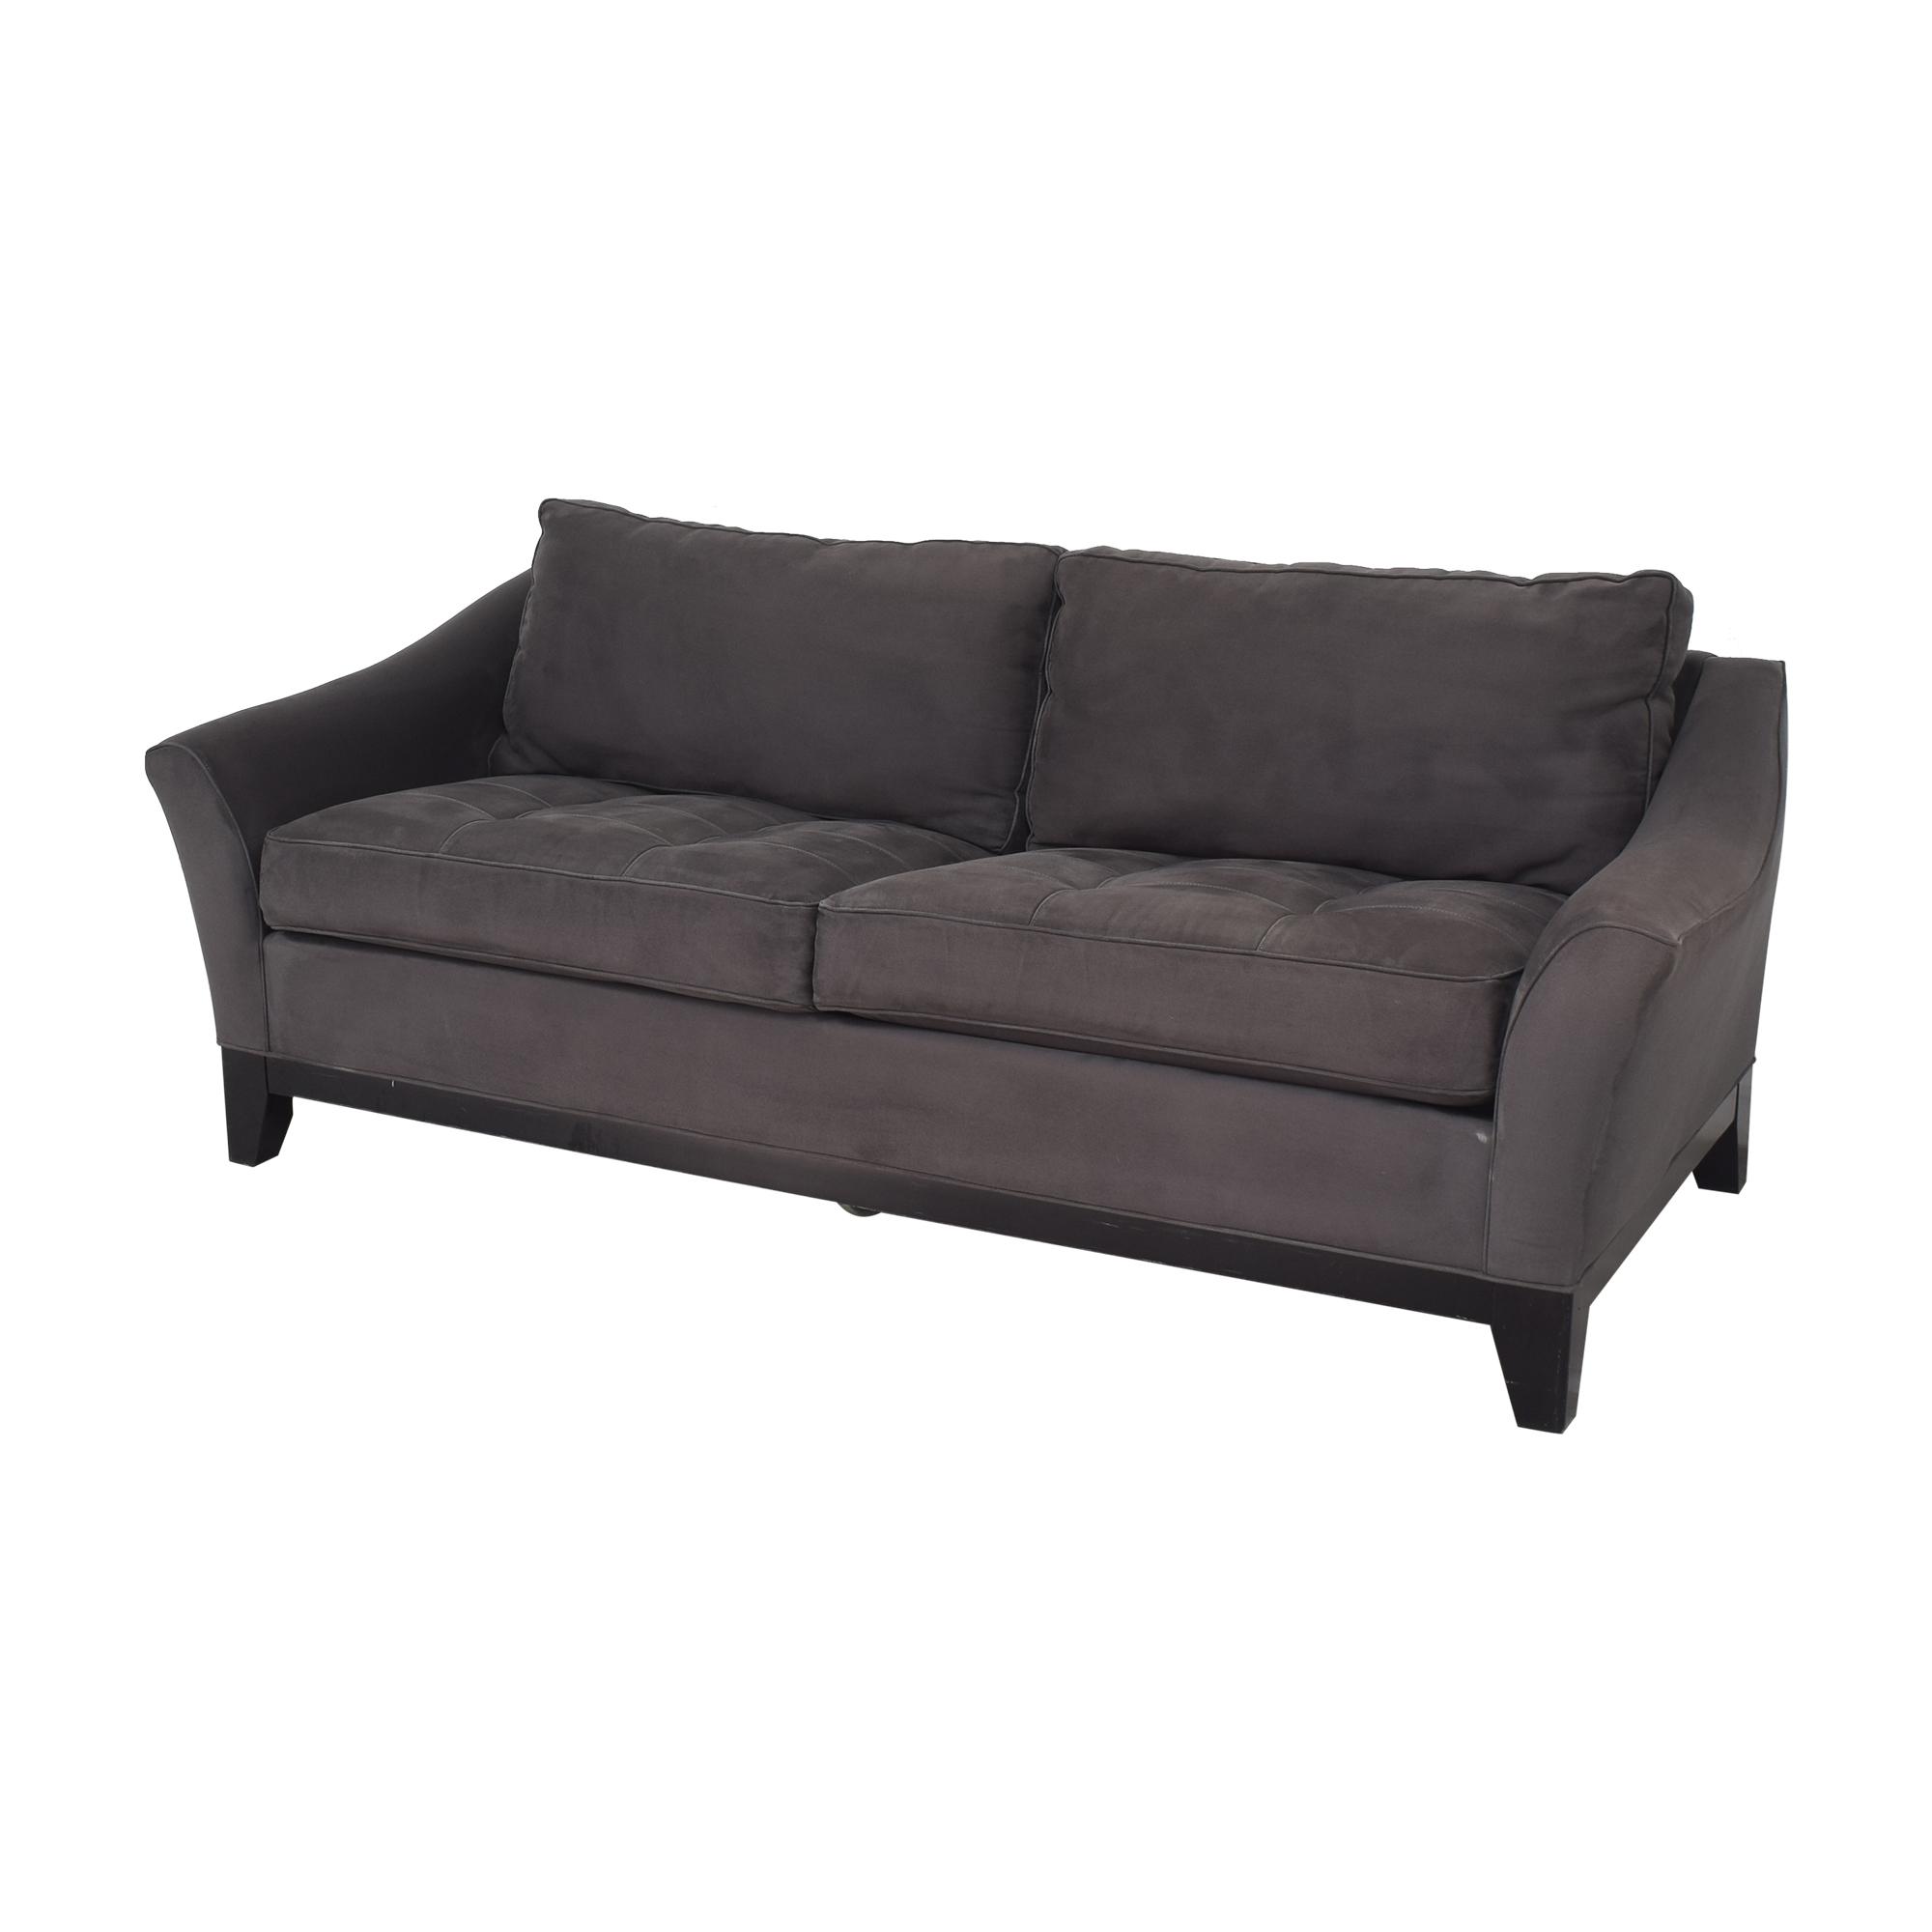 Raymour & Flanigan Raymour & Flanigan Rory Sleeper Sofa used